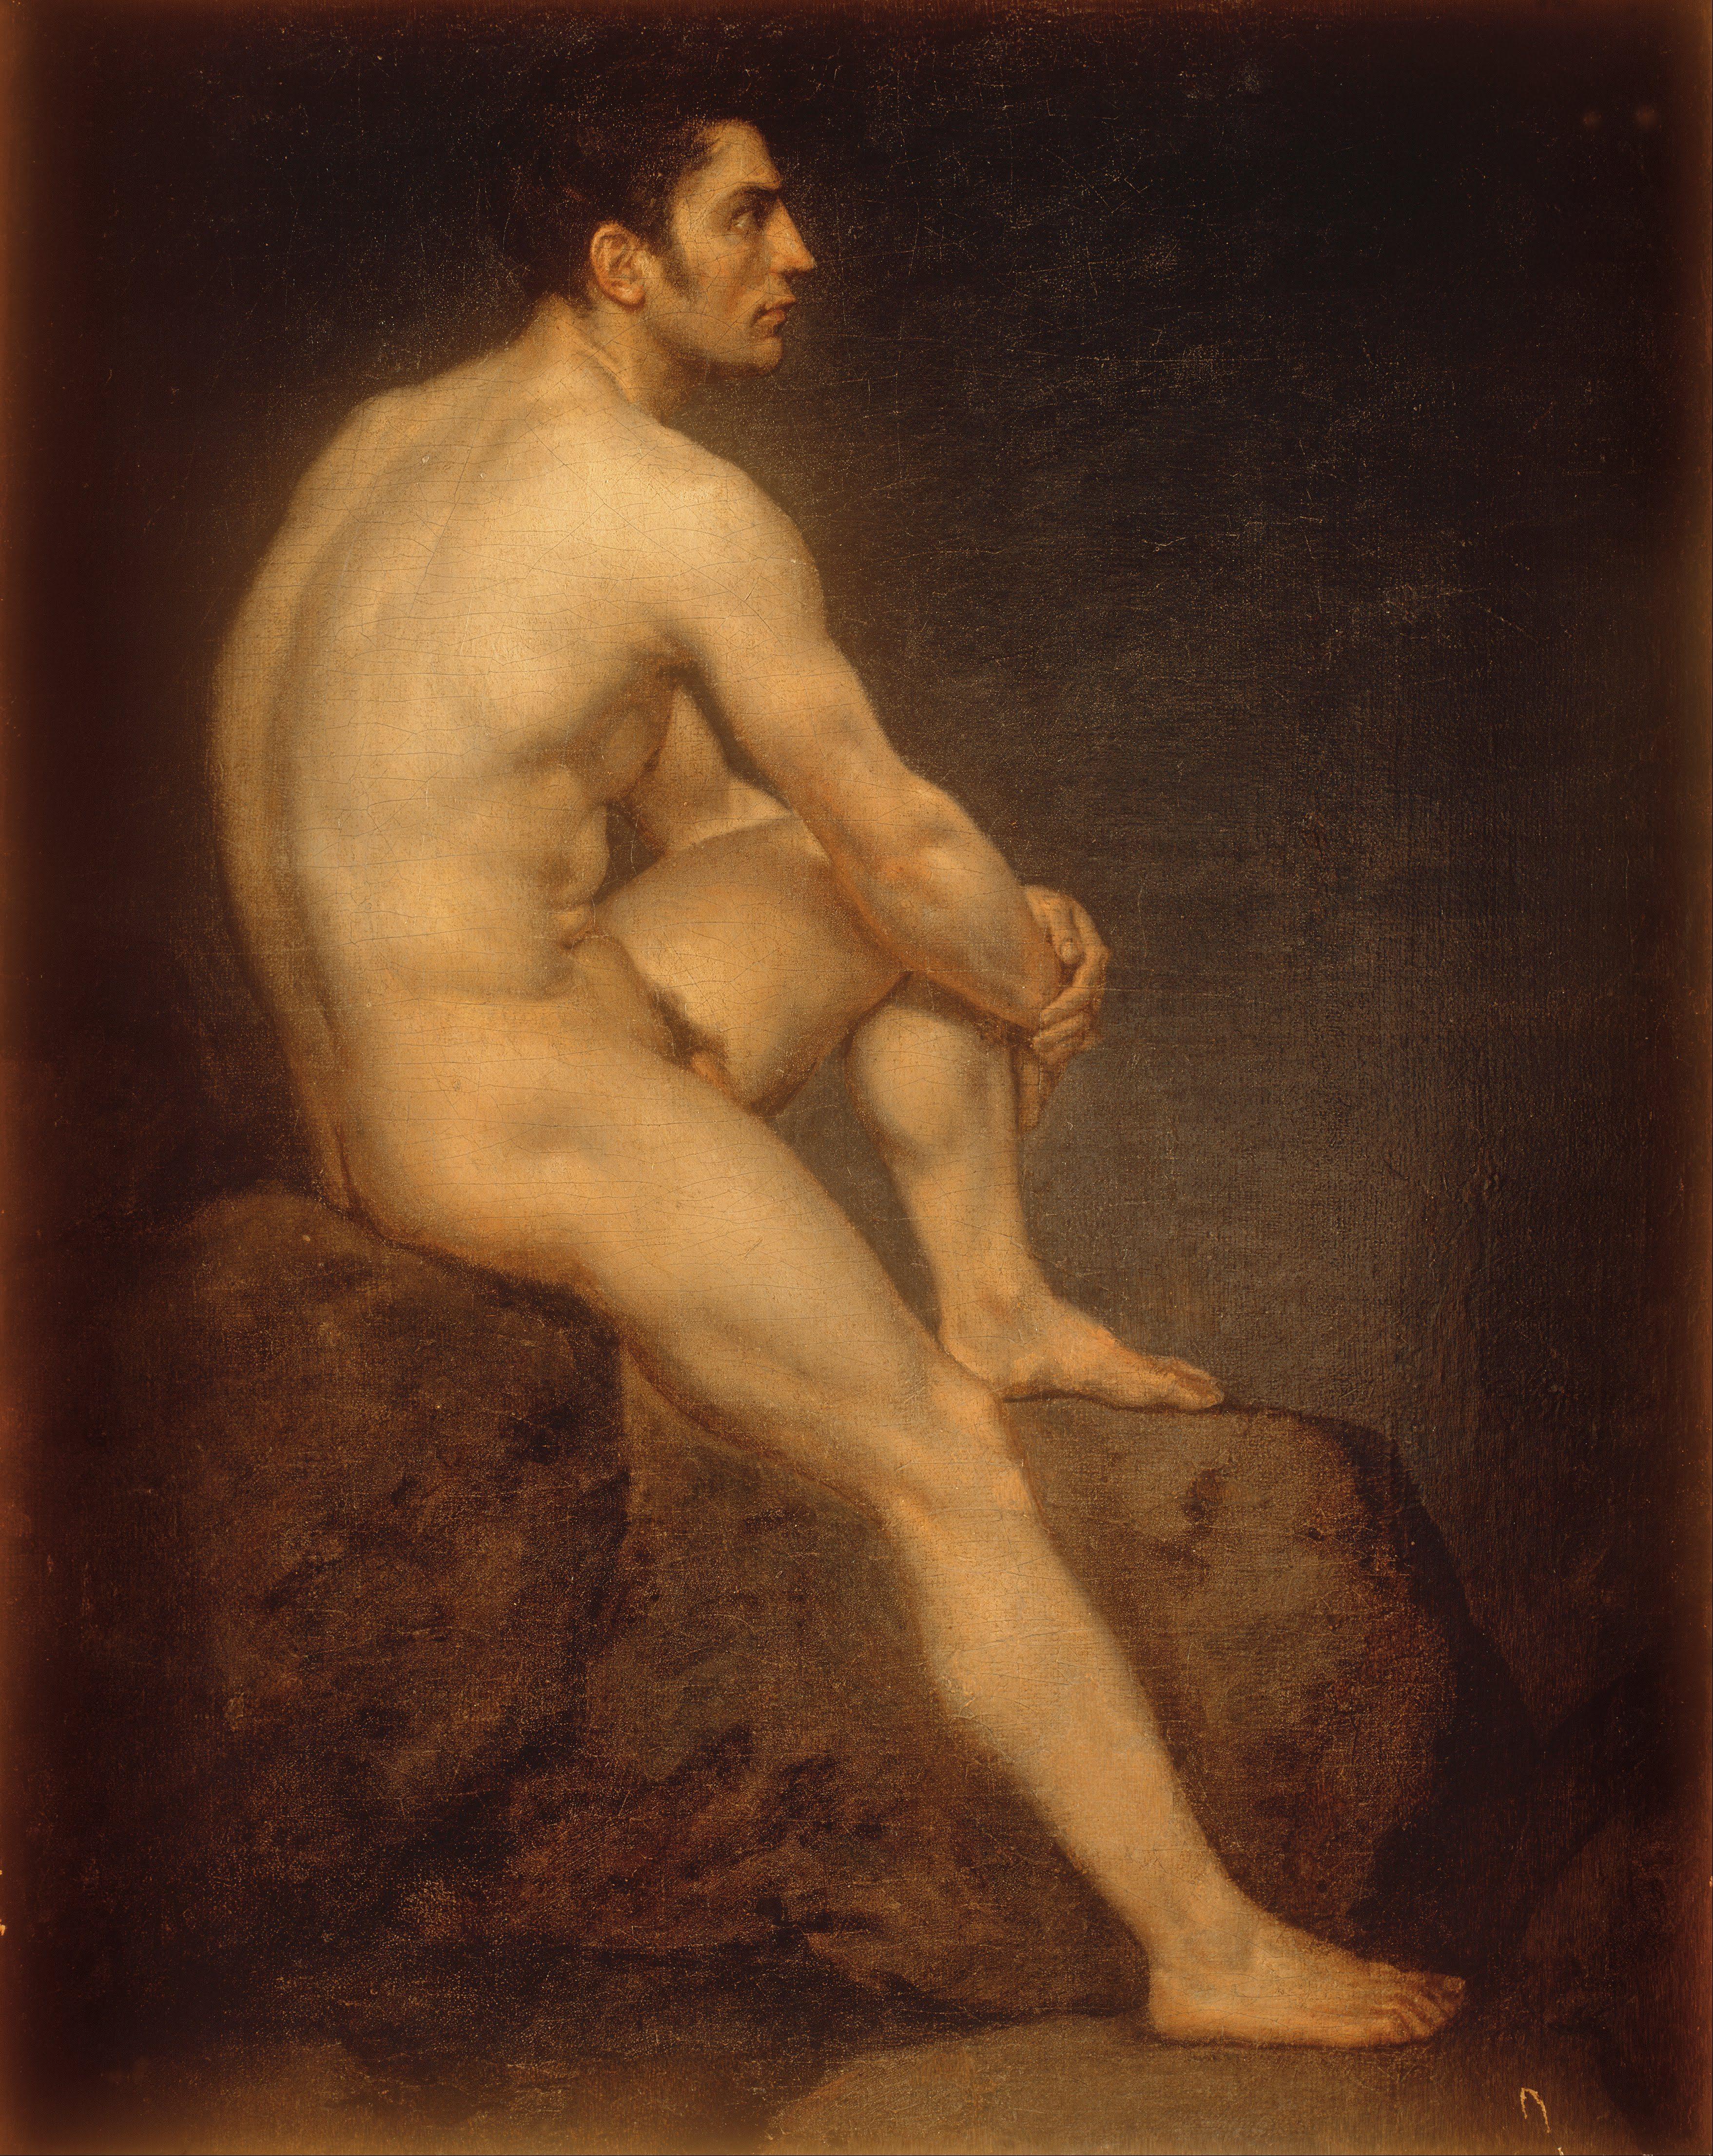 Sixlet reccomend krivon boys nudist